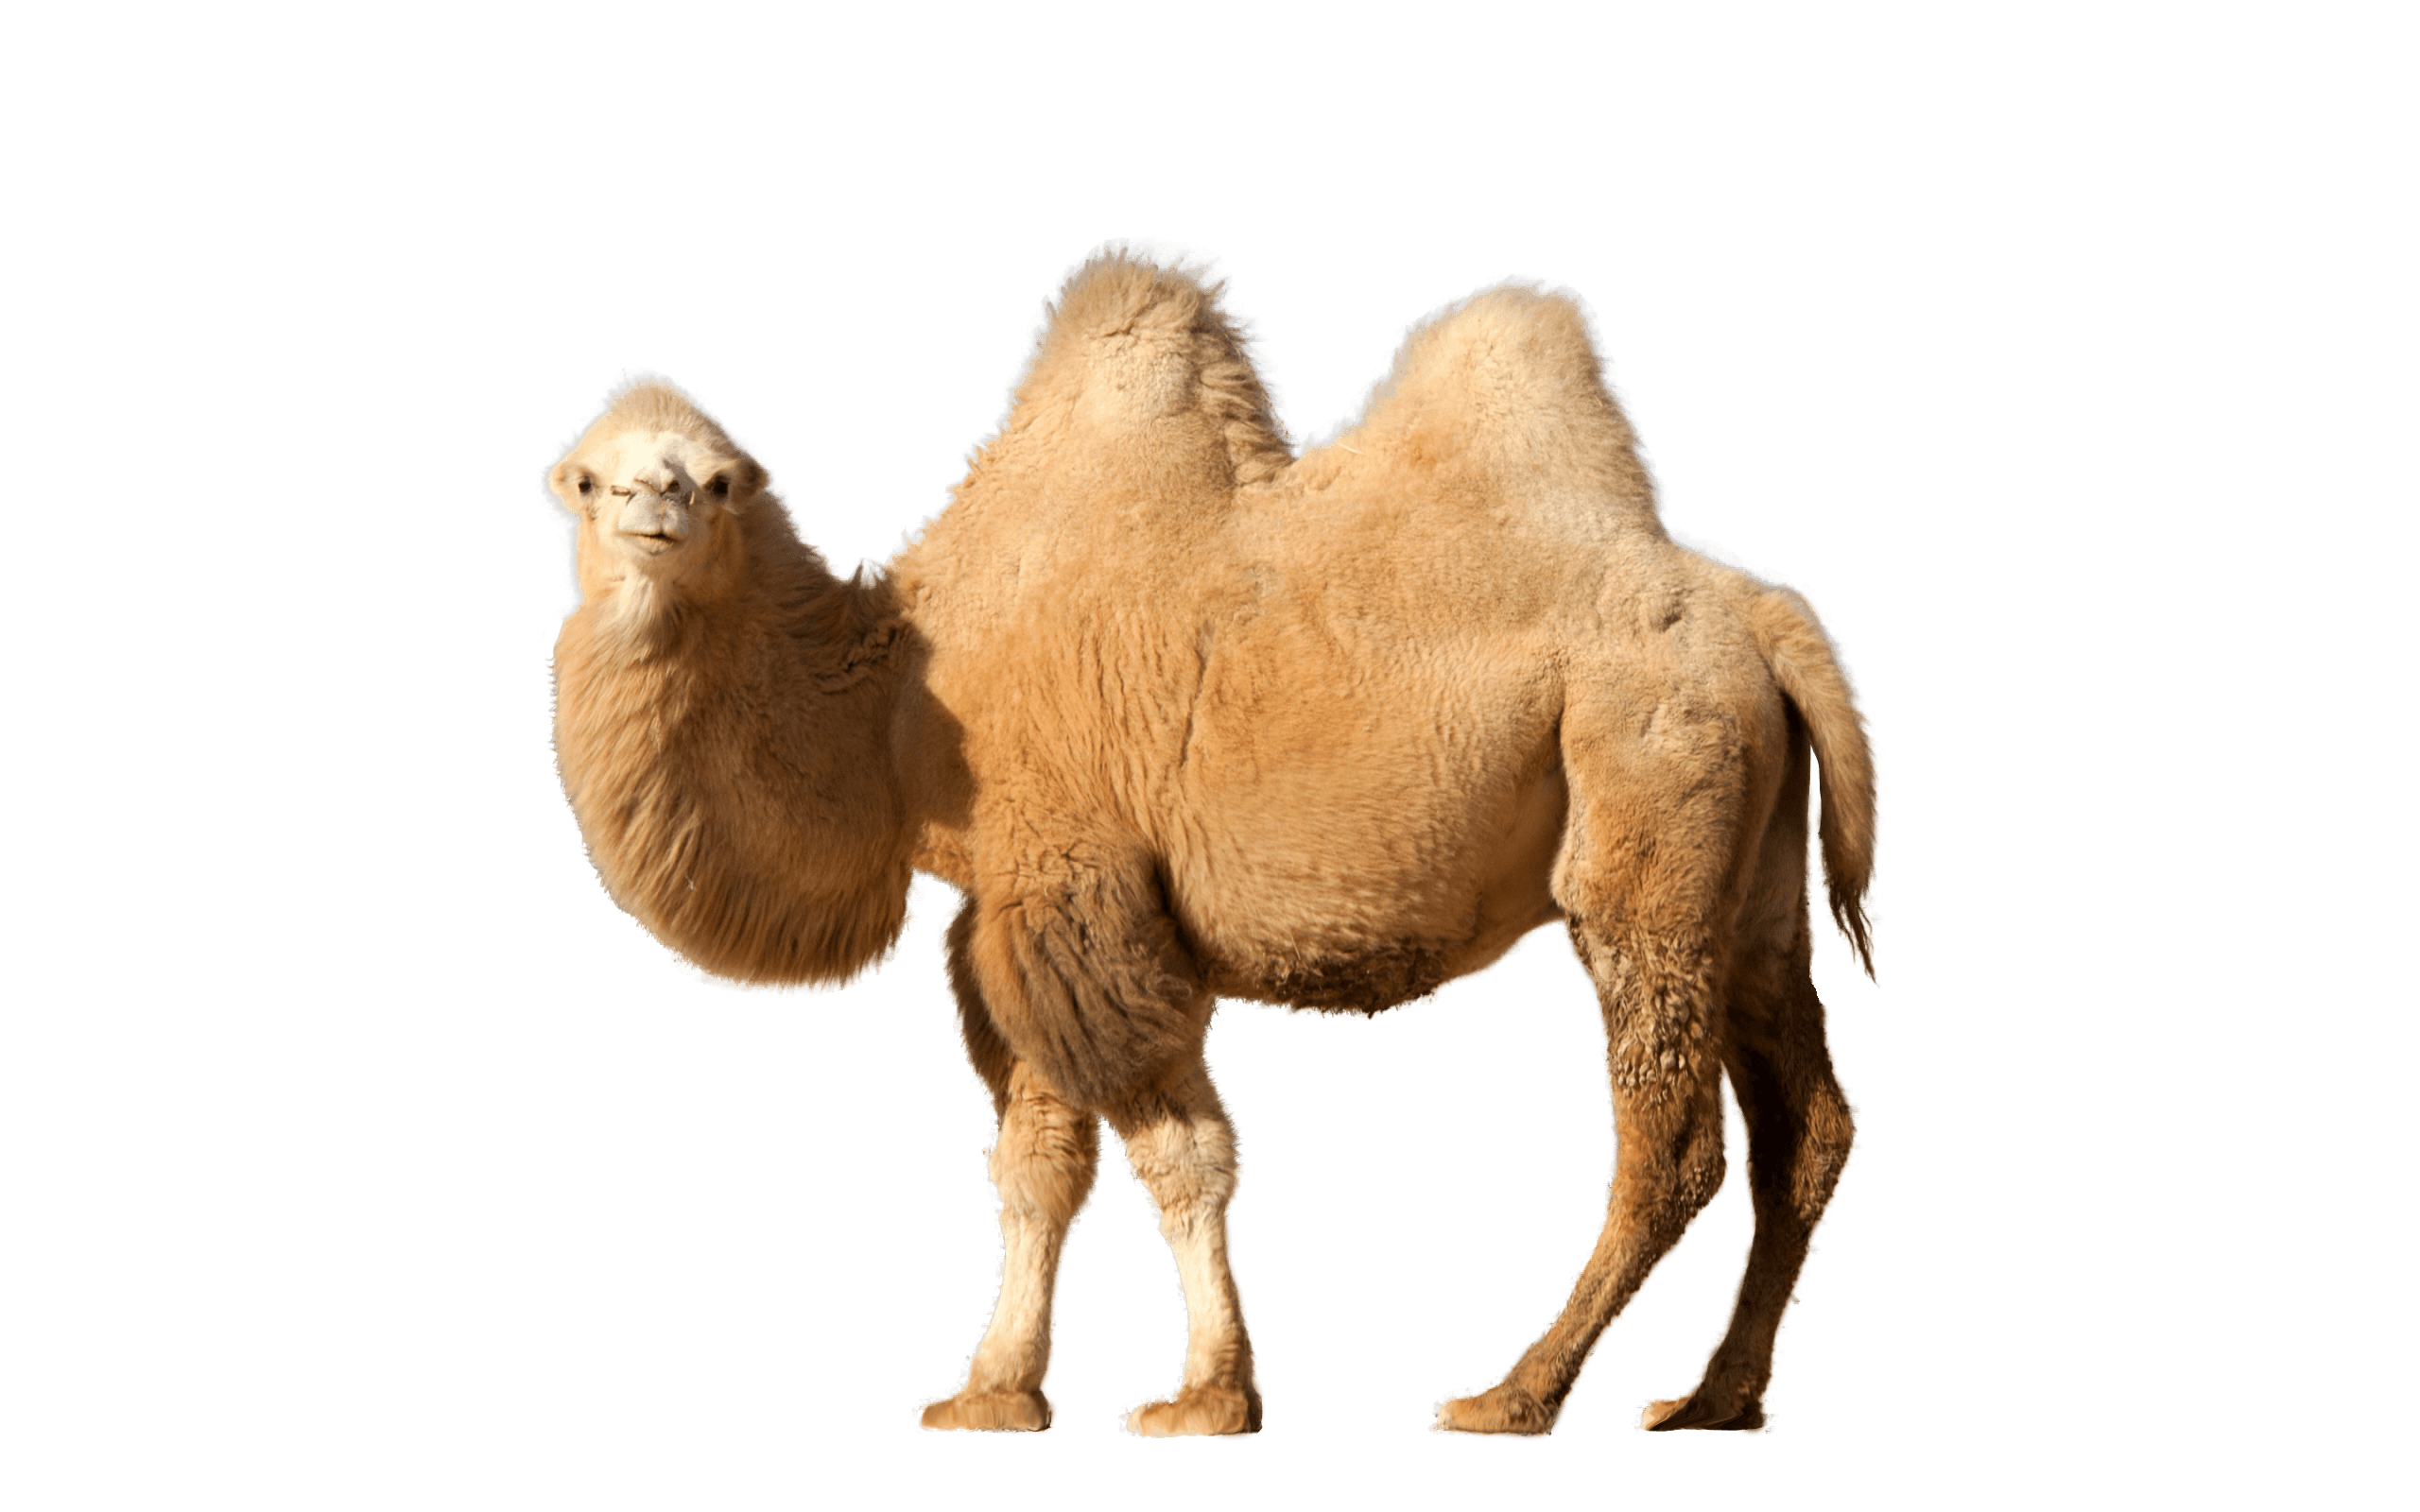 camel single transparent png stickpng